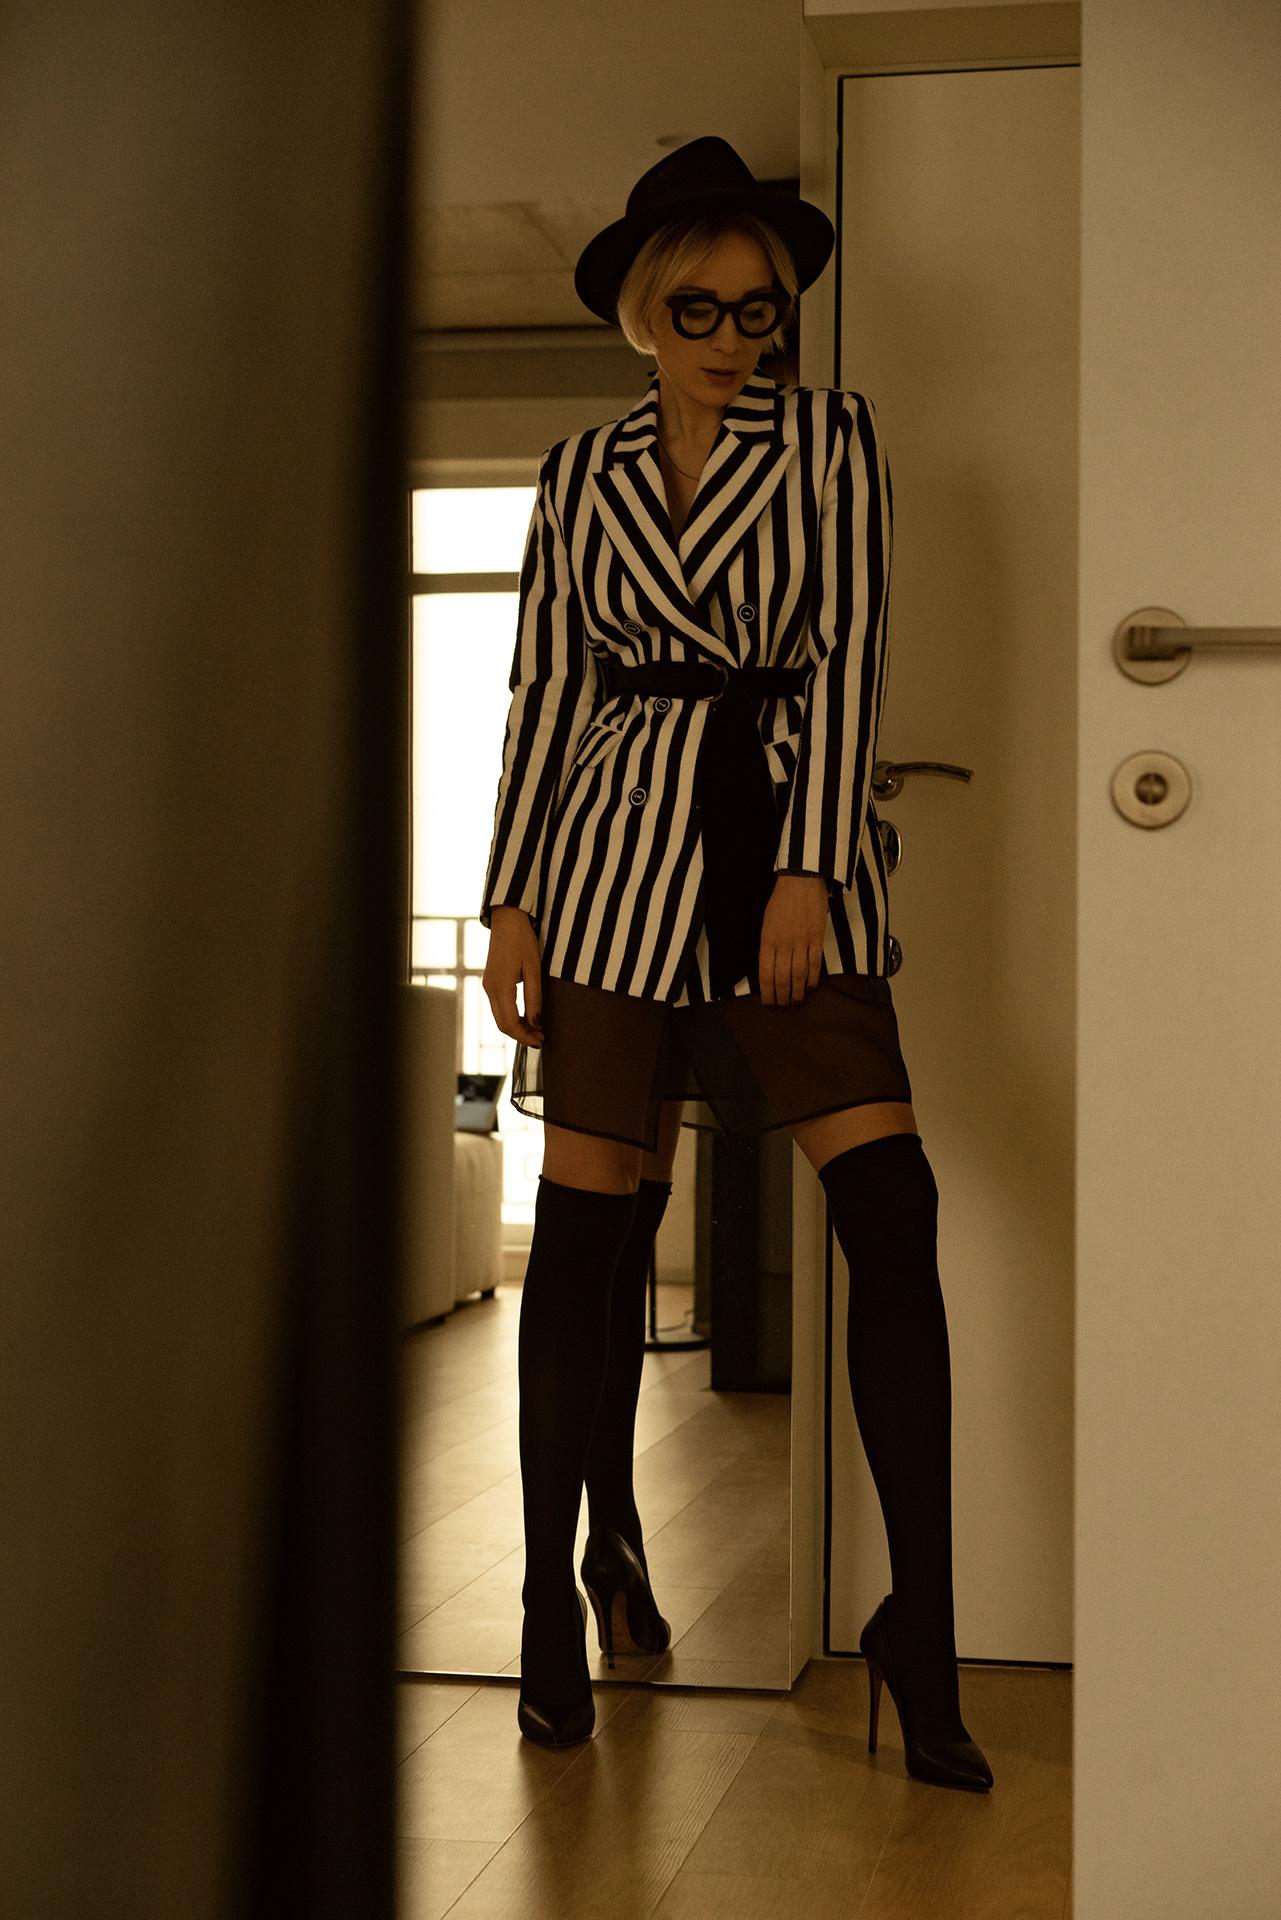 Style is all for me / фотограф Артур Каплун